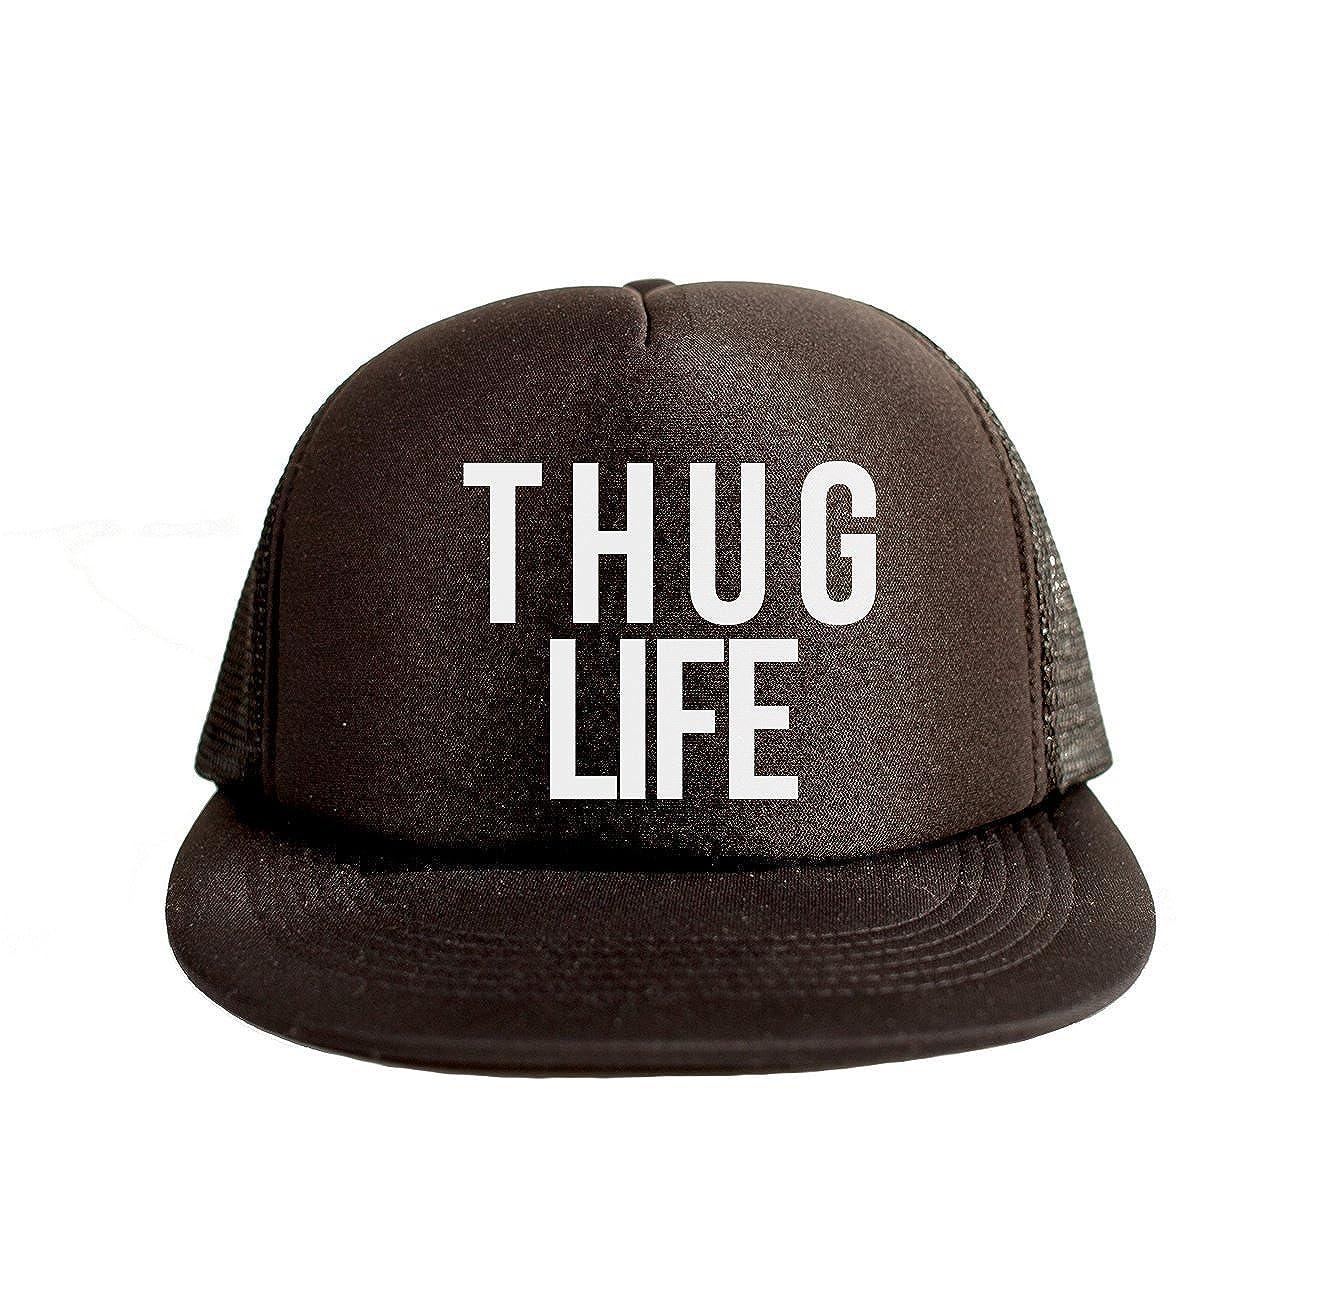 167a0fb9042 Amazon.com  Thug Life Cool Swag Hip Hop Print 80s Style Snapback Hat Cap  Black  Clothing